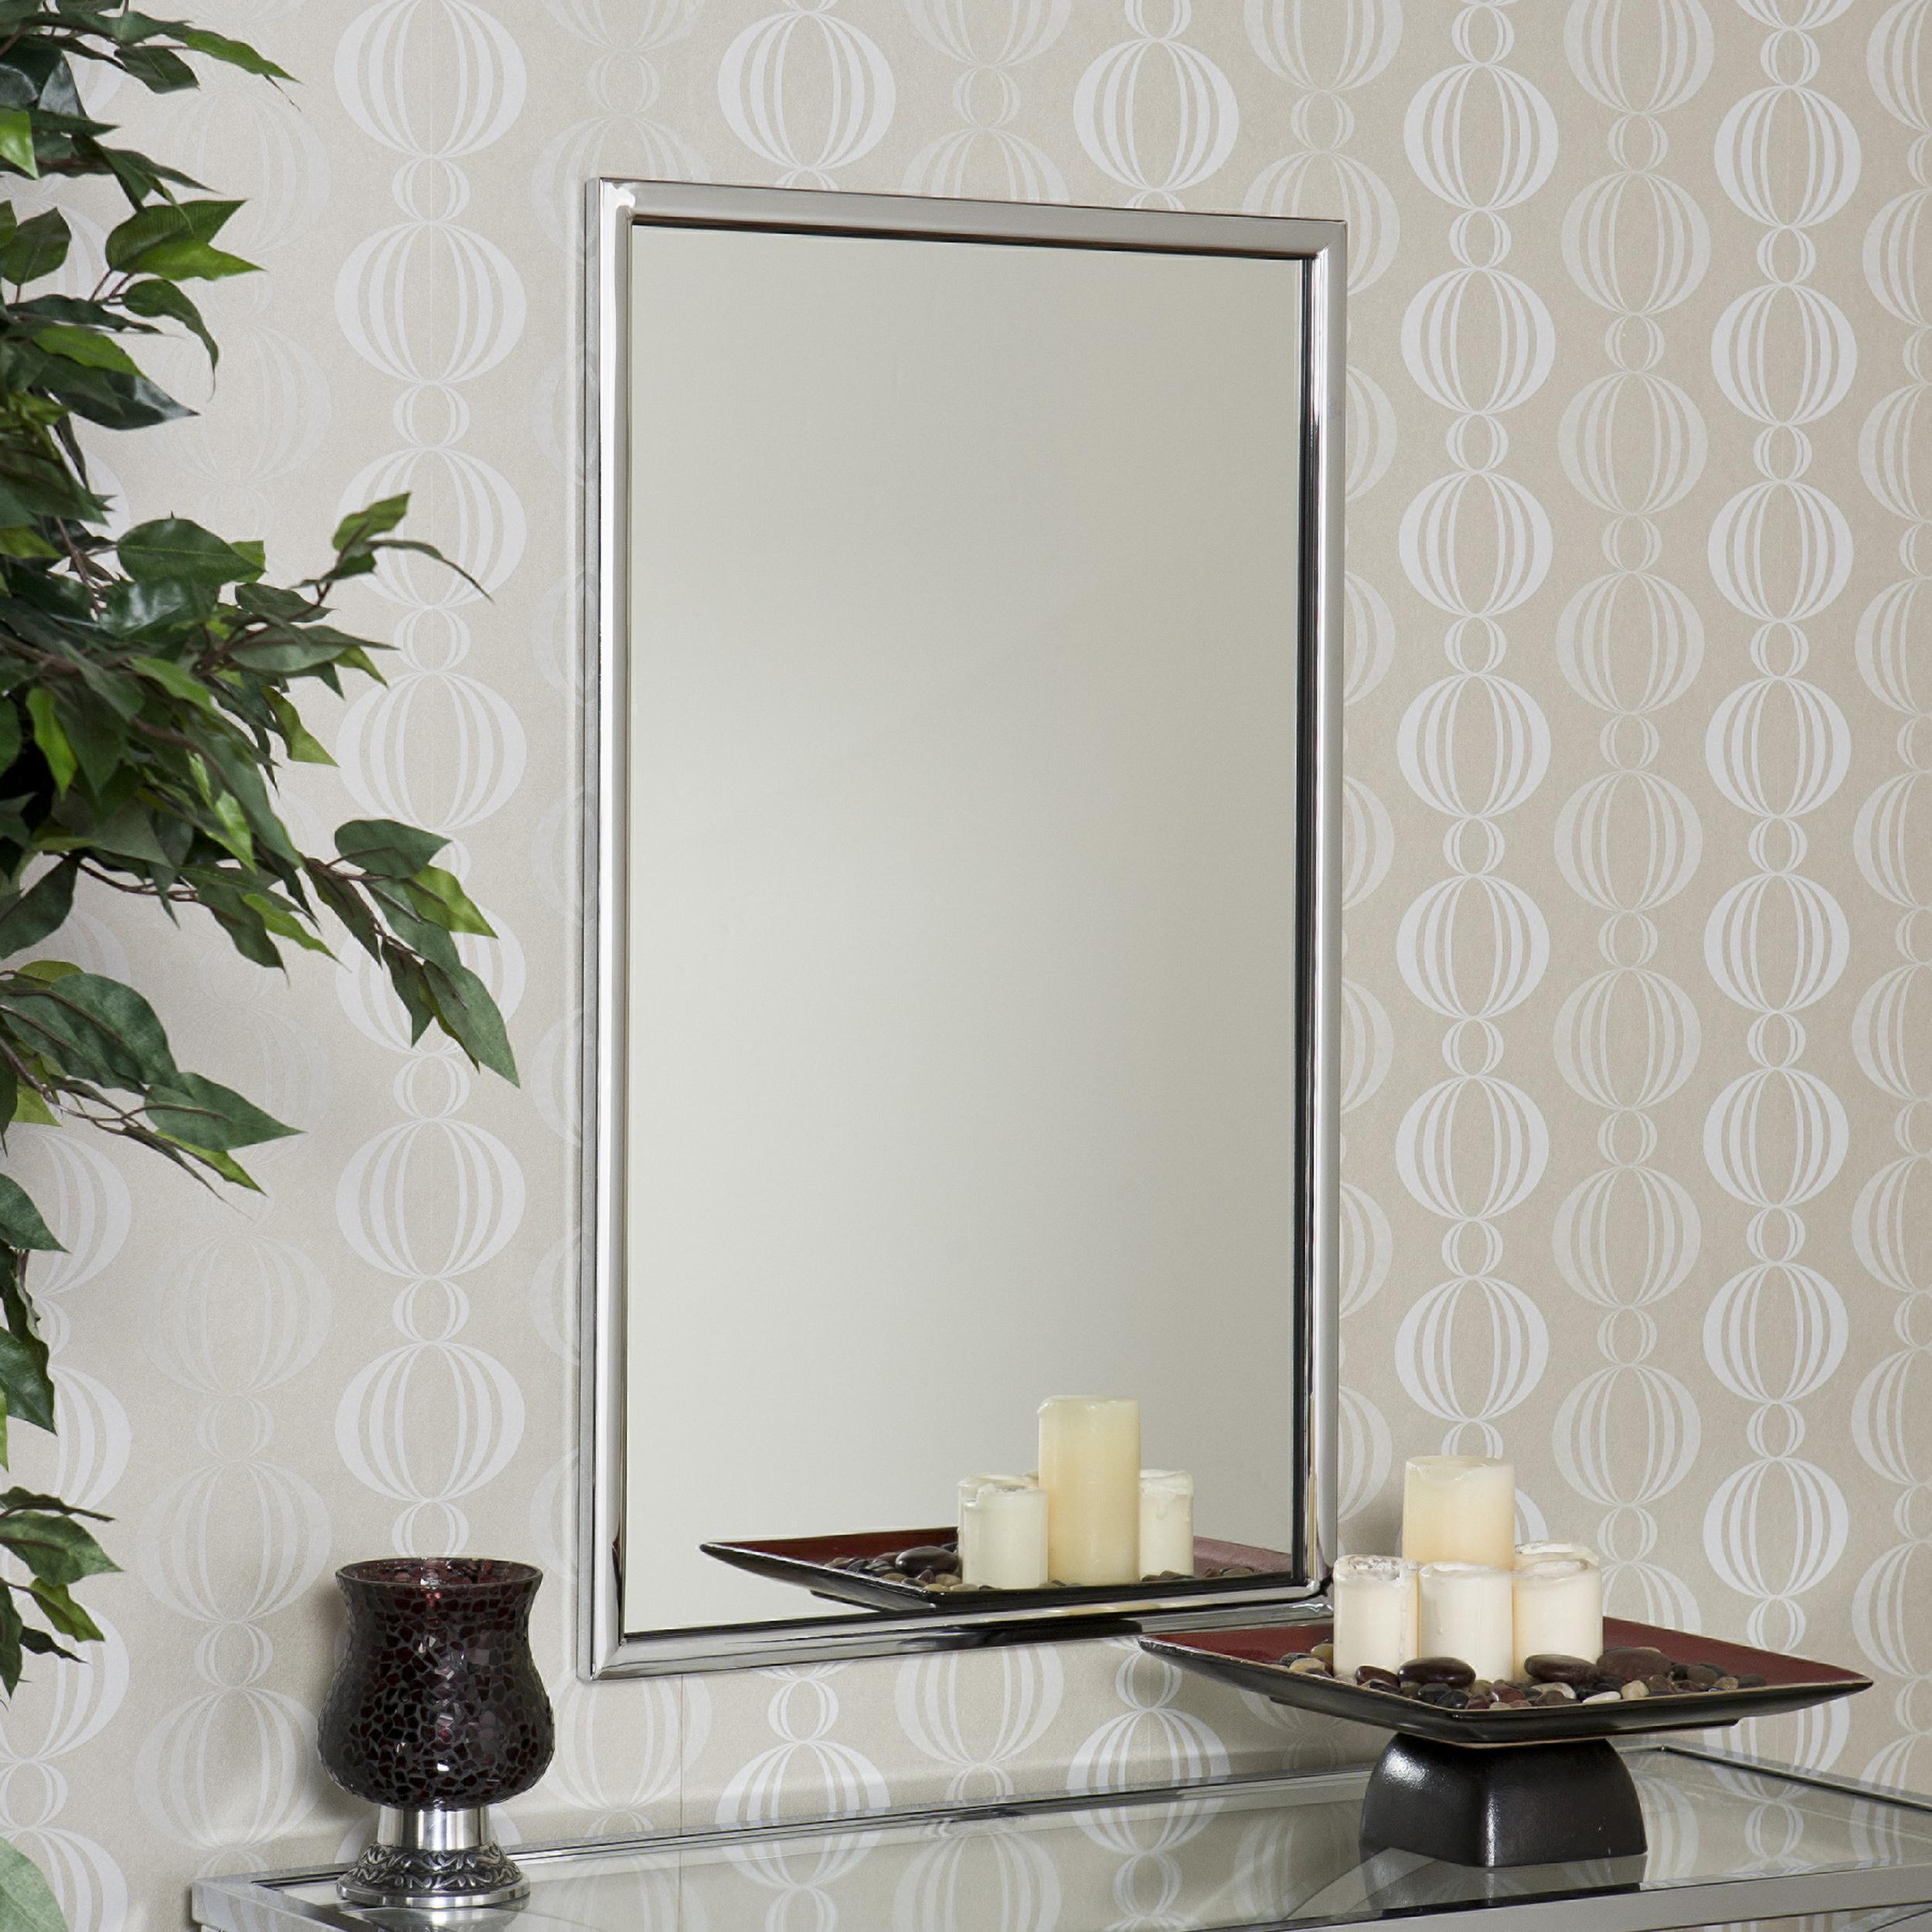 Amazon.com: Southern Enterprises SEI Vogue Chrome Wall Mirror ...